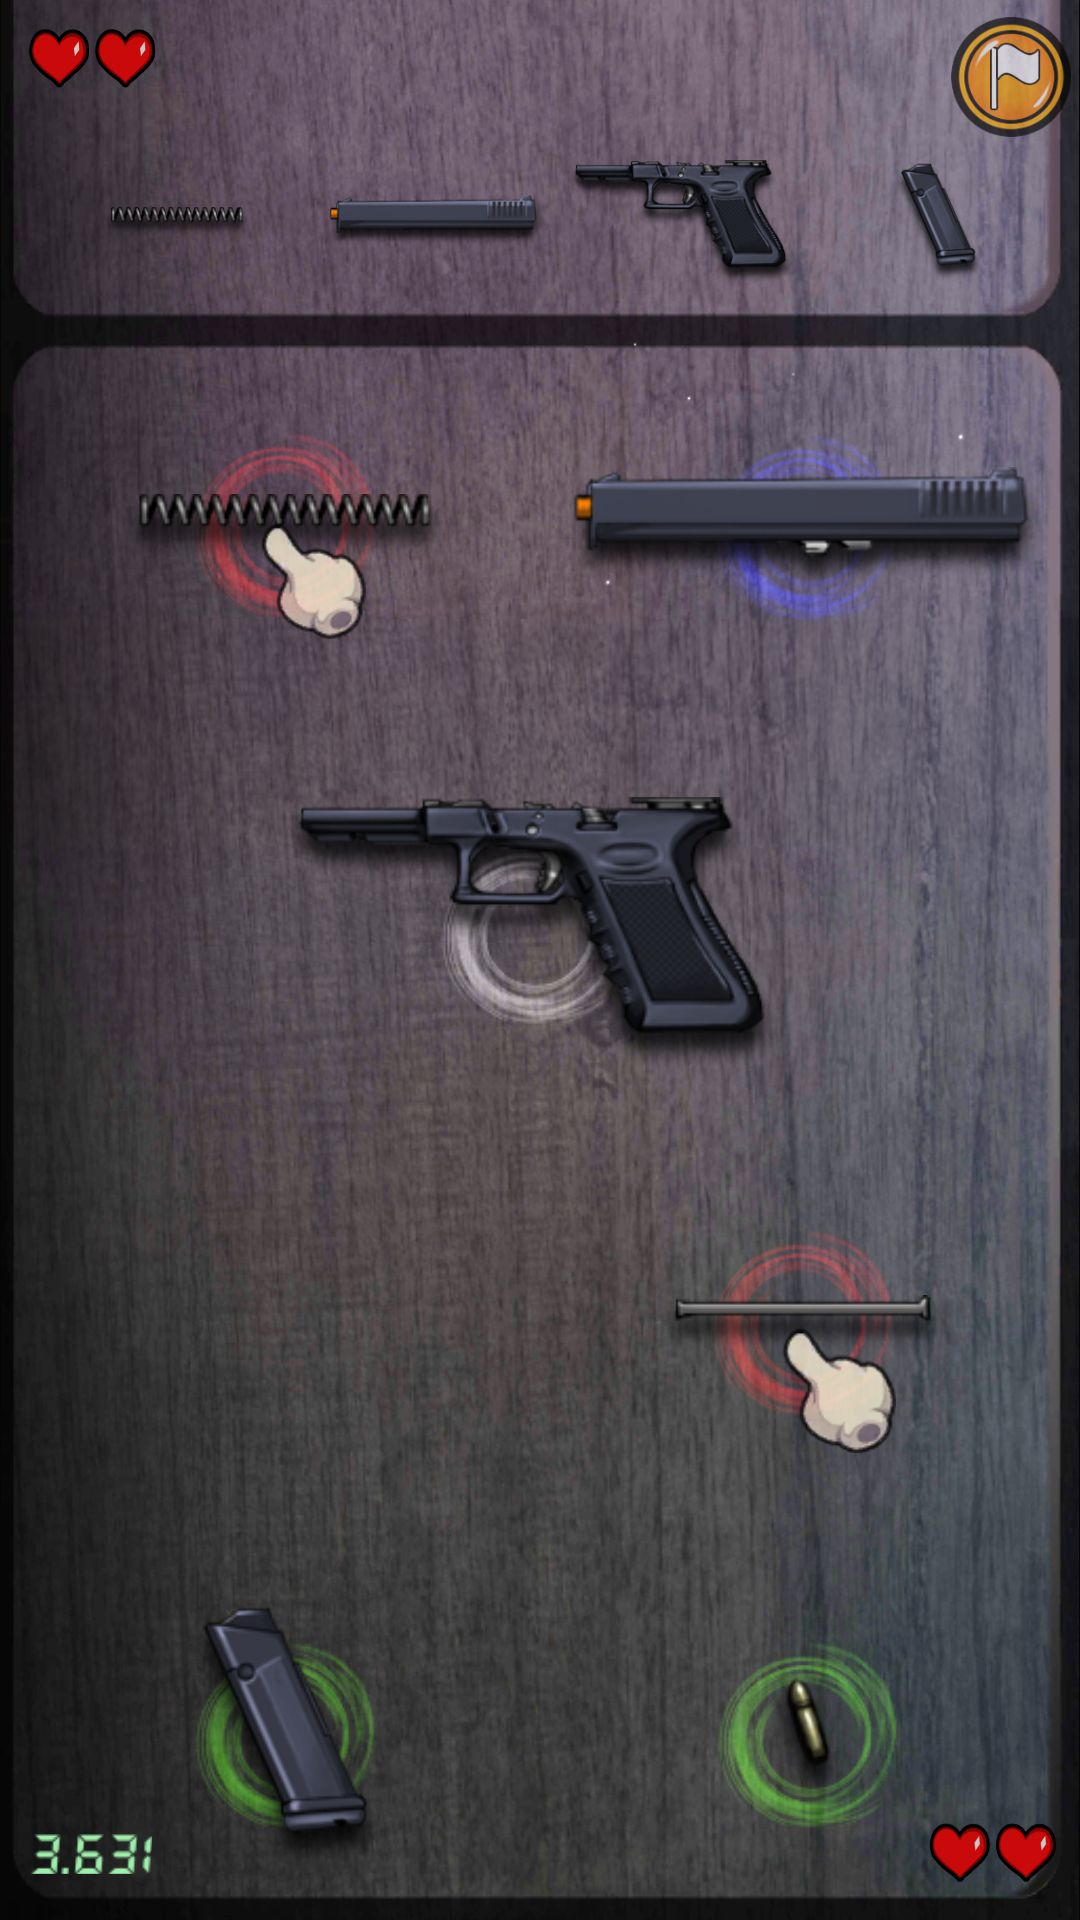 androidアプリ ガンスリンガー(GunSlinger - The Fast Gun)攻略スクリーンショット2